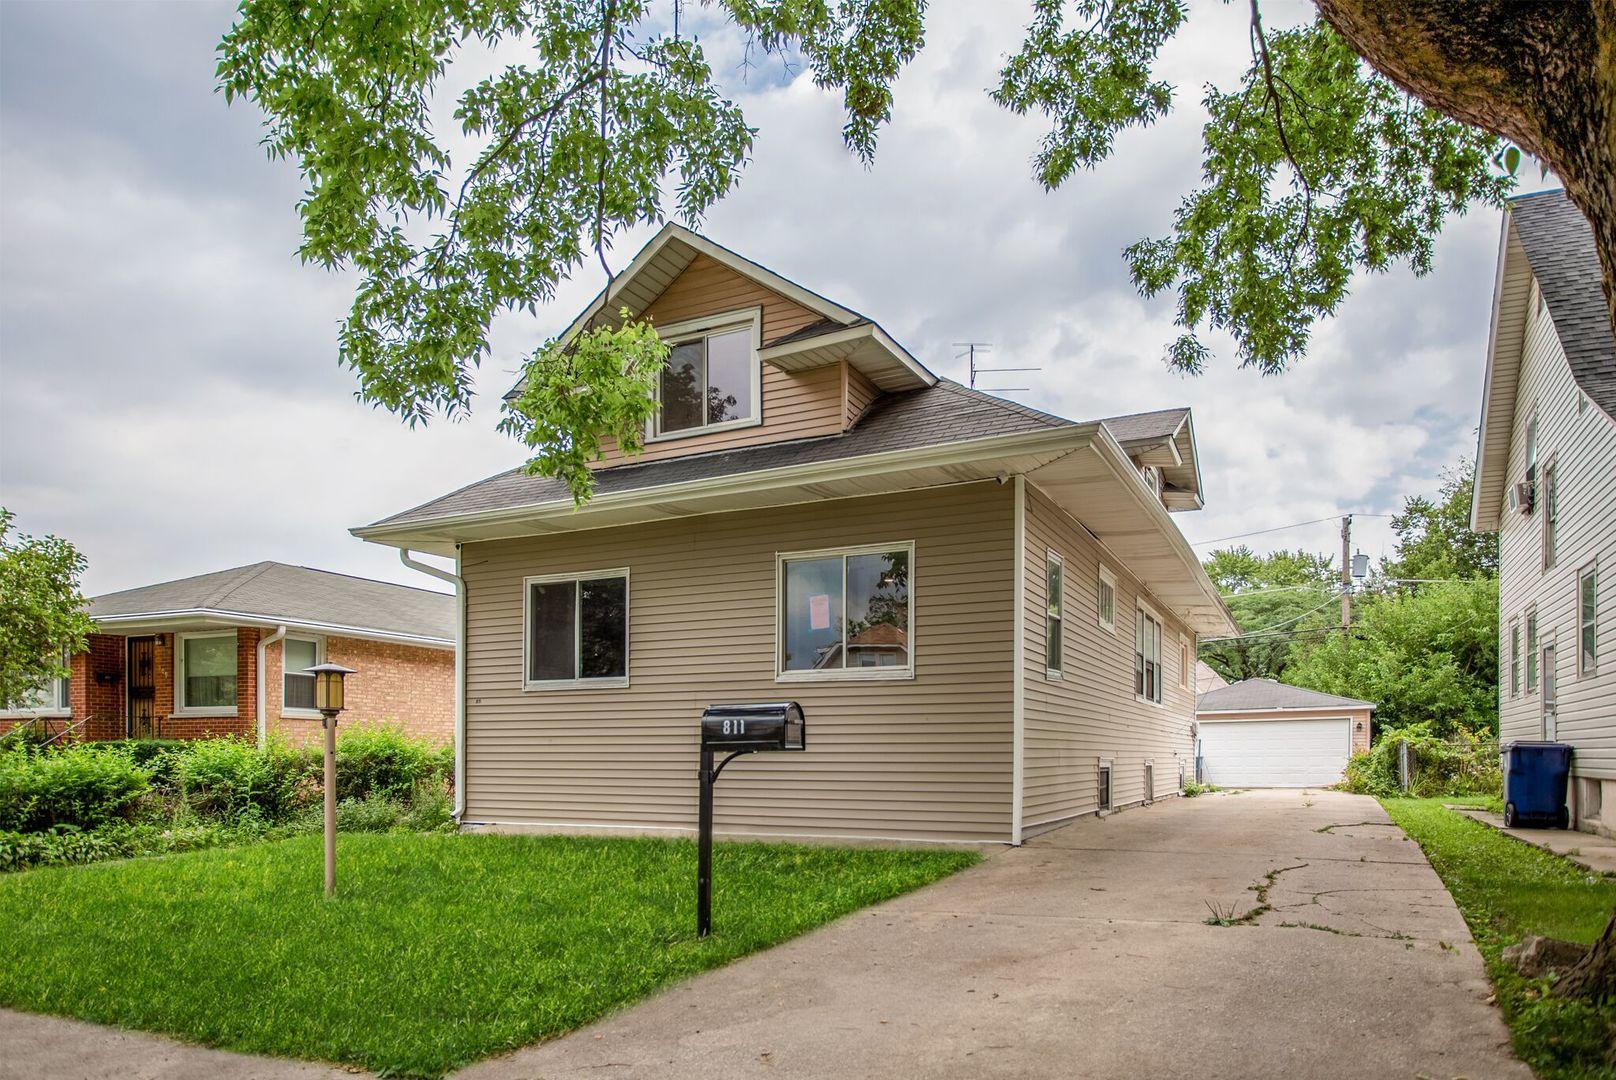 811 South 8th, Maywood, Illinois, 60153